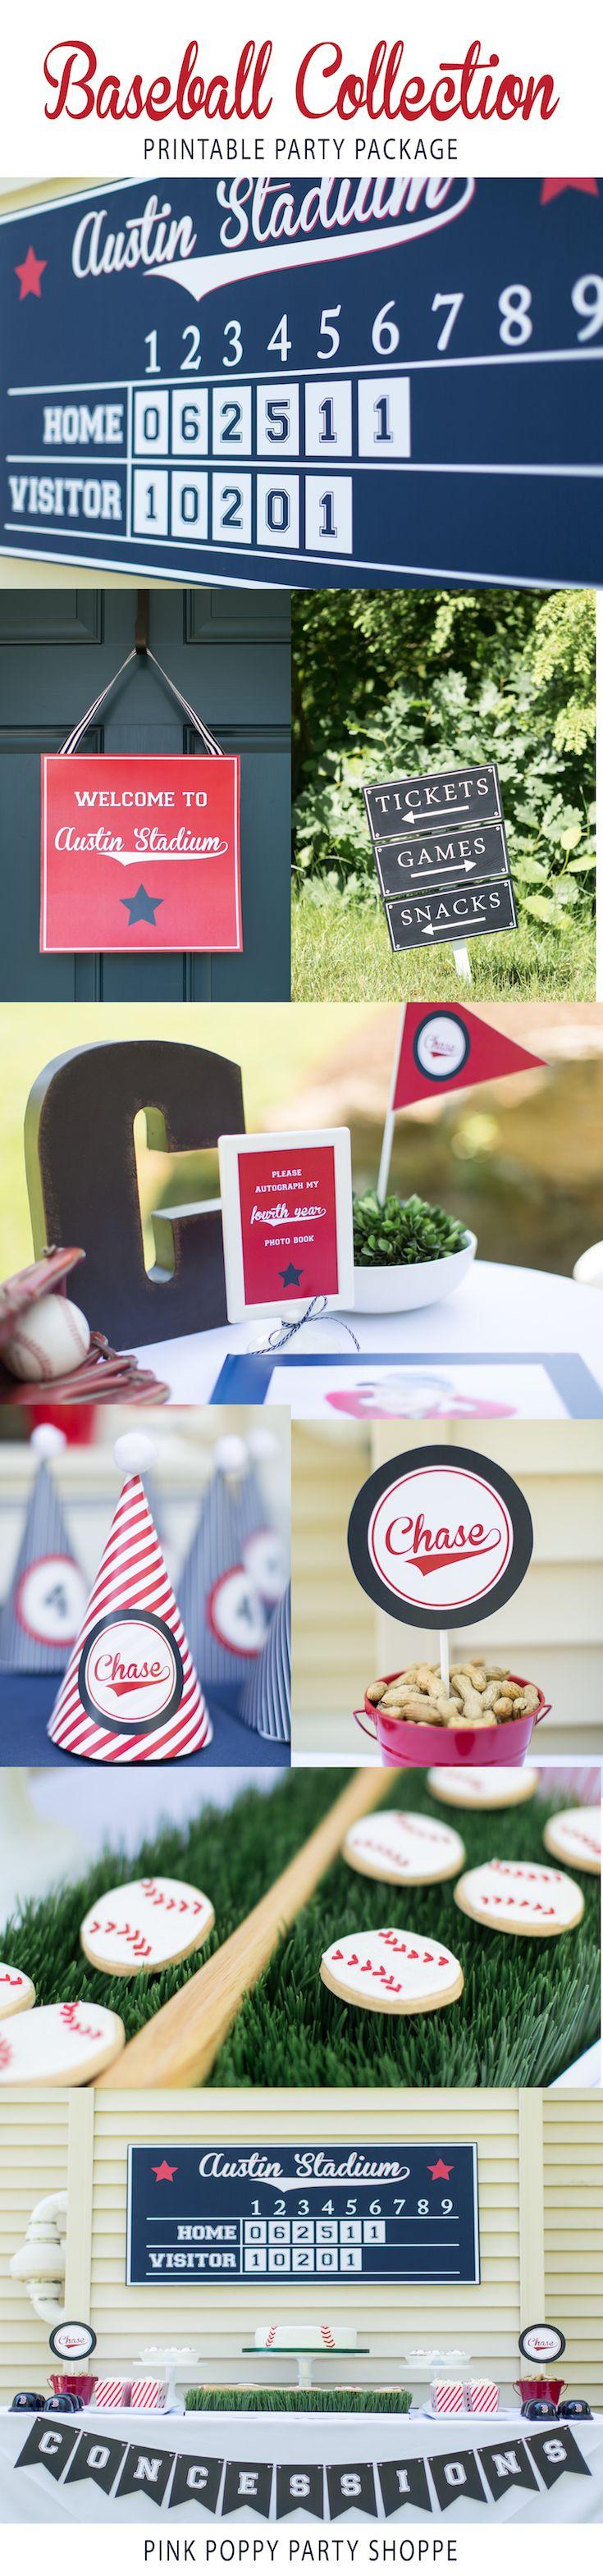 Baseball Themed Birthday Party | Baseball Printables | Red Sox Party